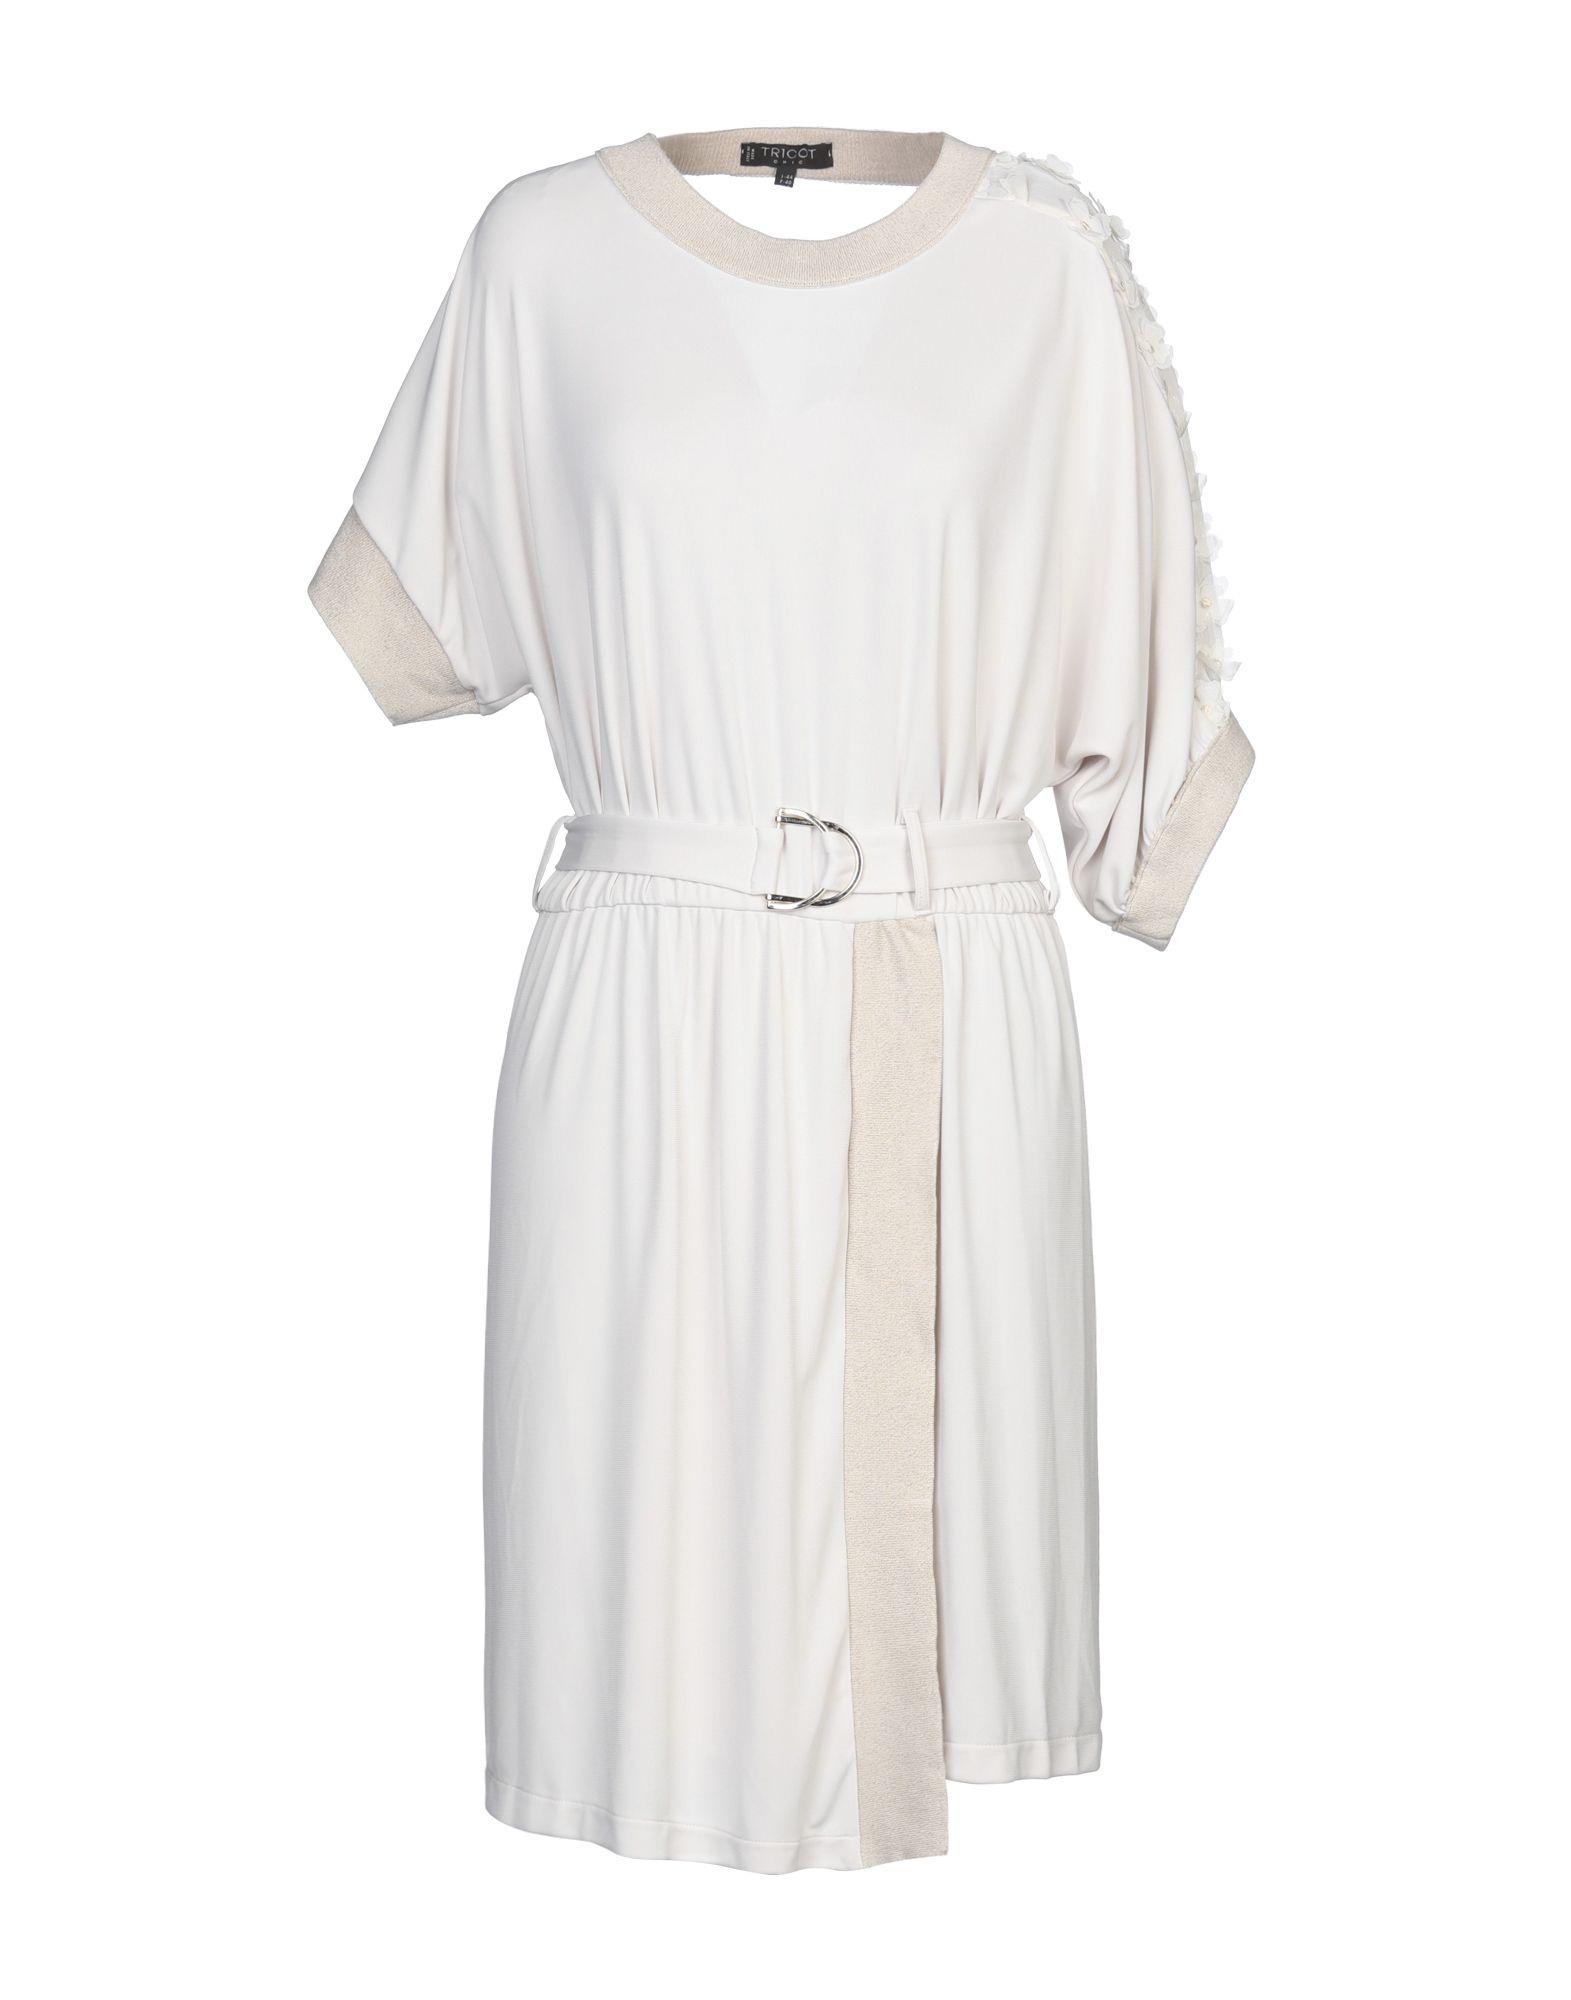 цена TRICOT CHIC Короткое платье онлайн в 2017 году